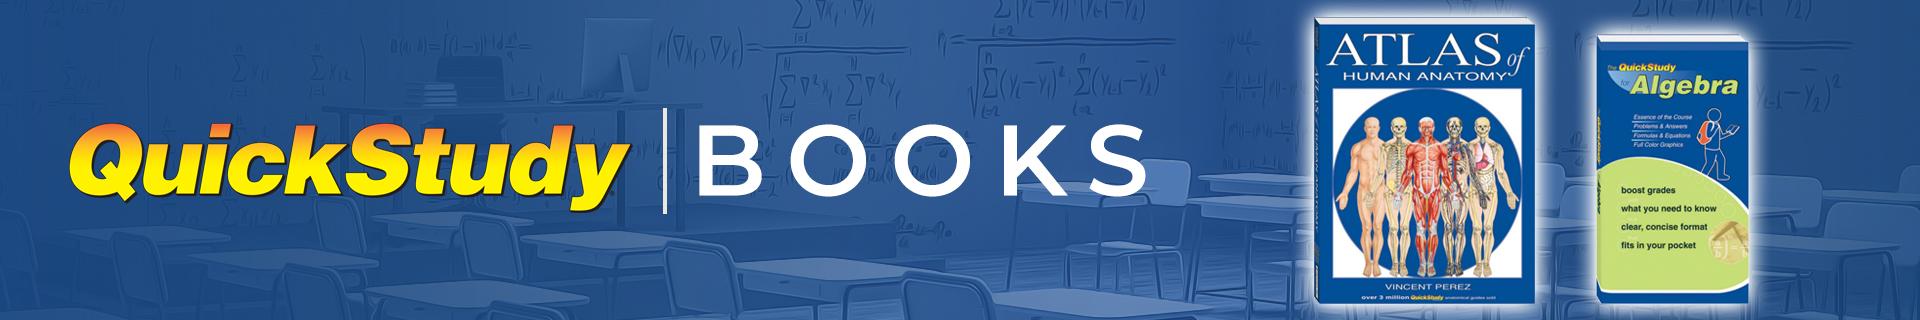 books-pagebanner.jpg